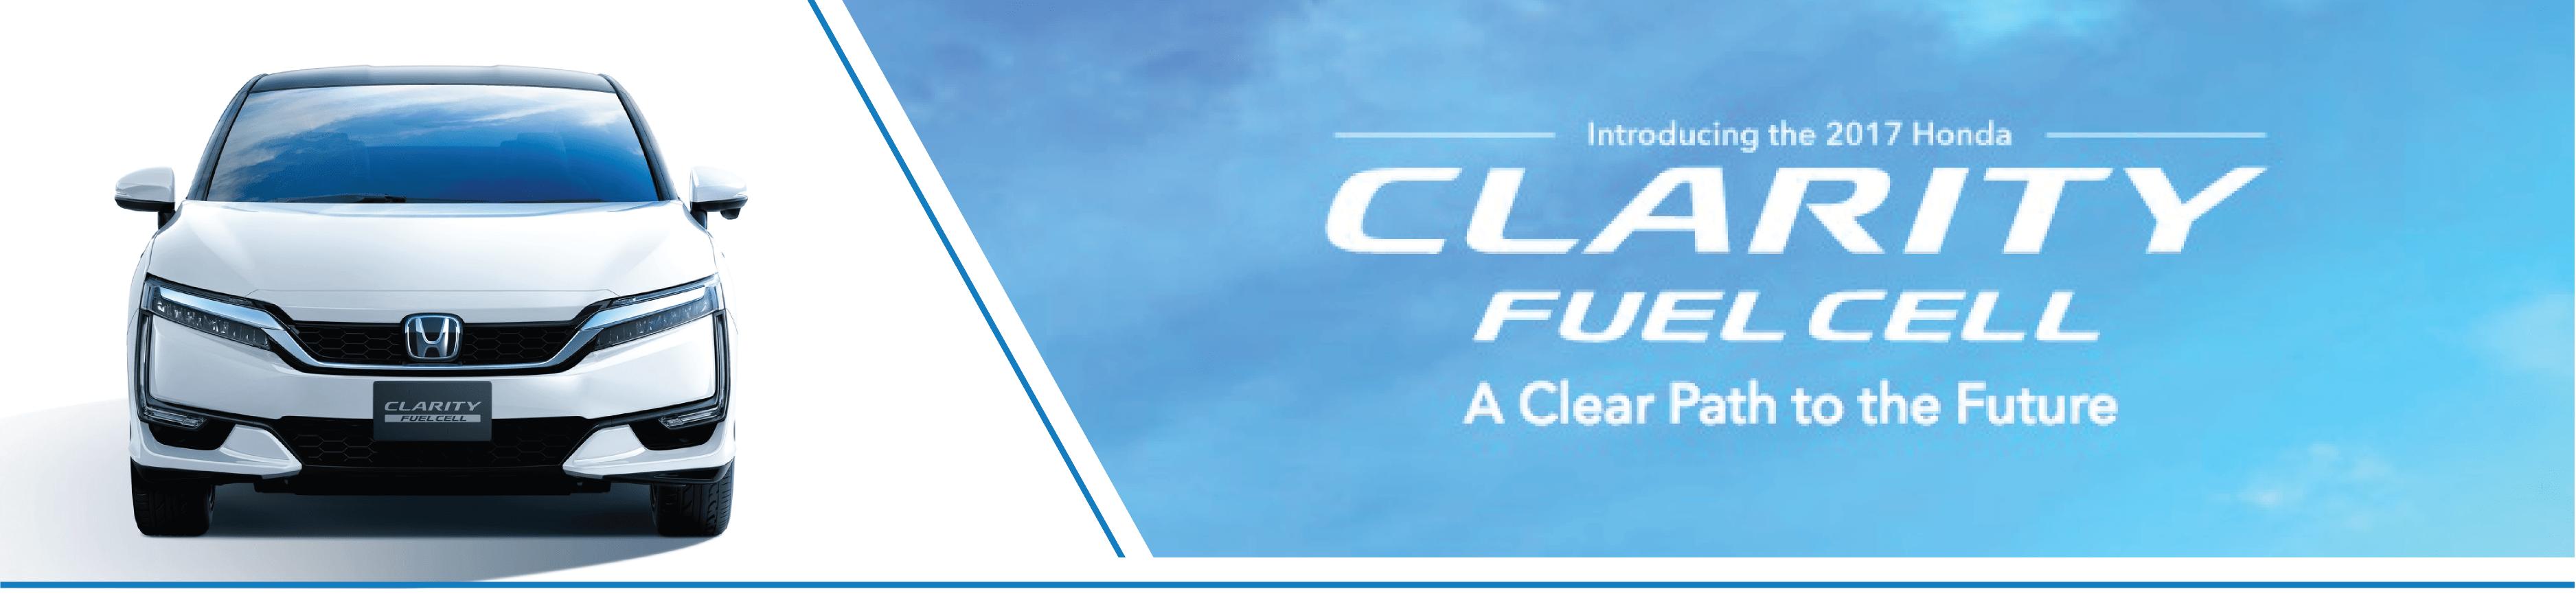 2017 Honda Clarity Banner